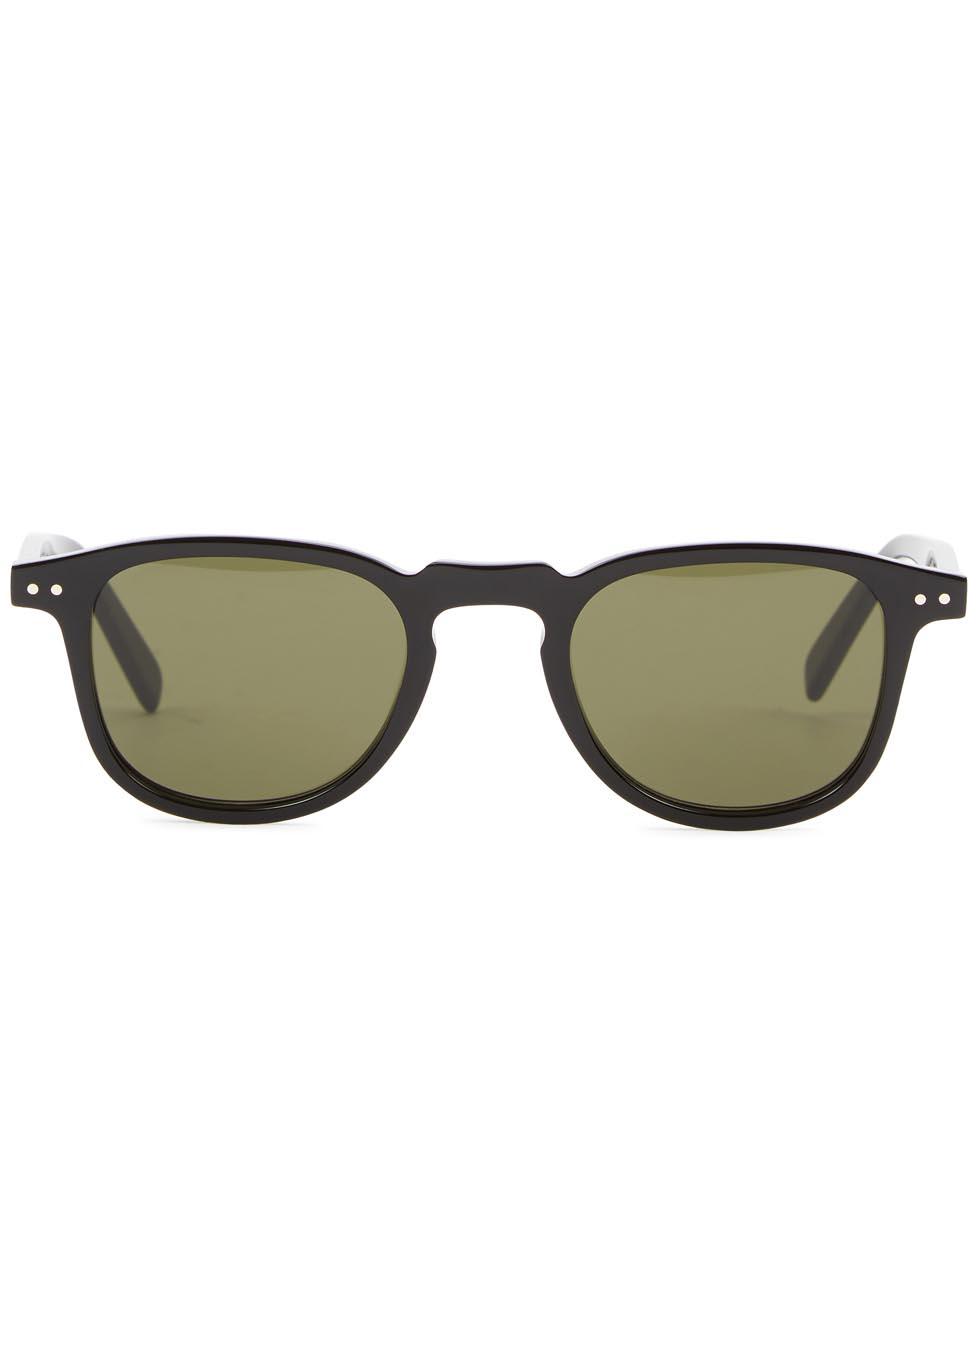 Freddy oval-frame sunglasses - Celine